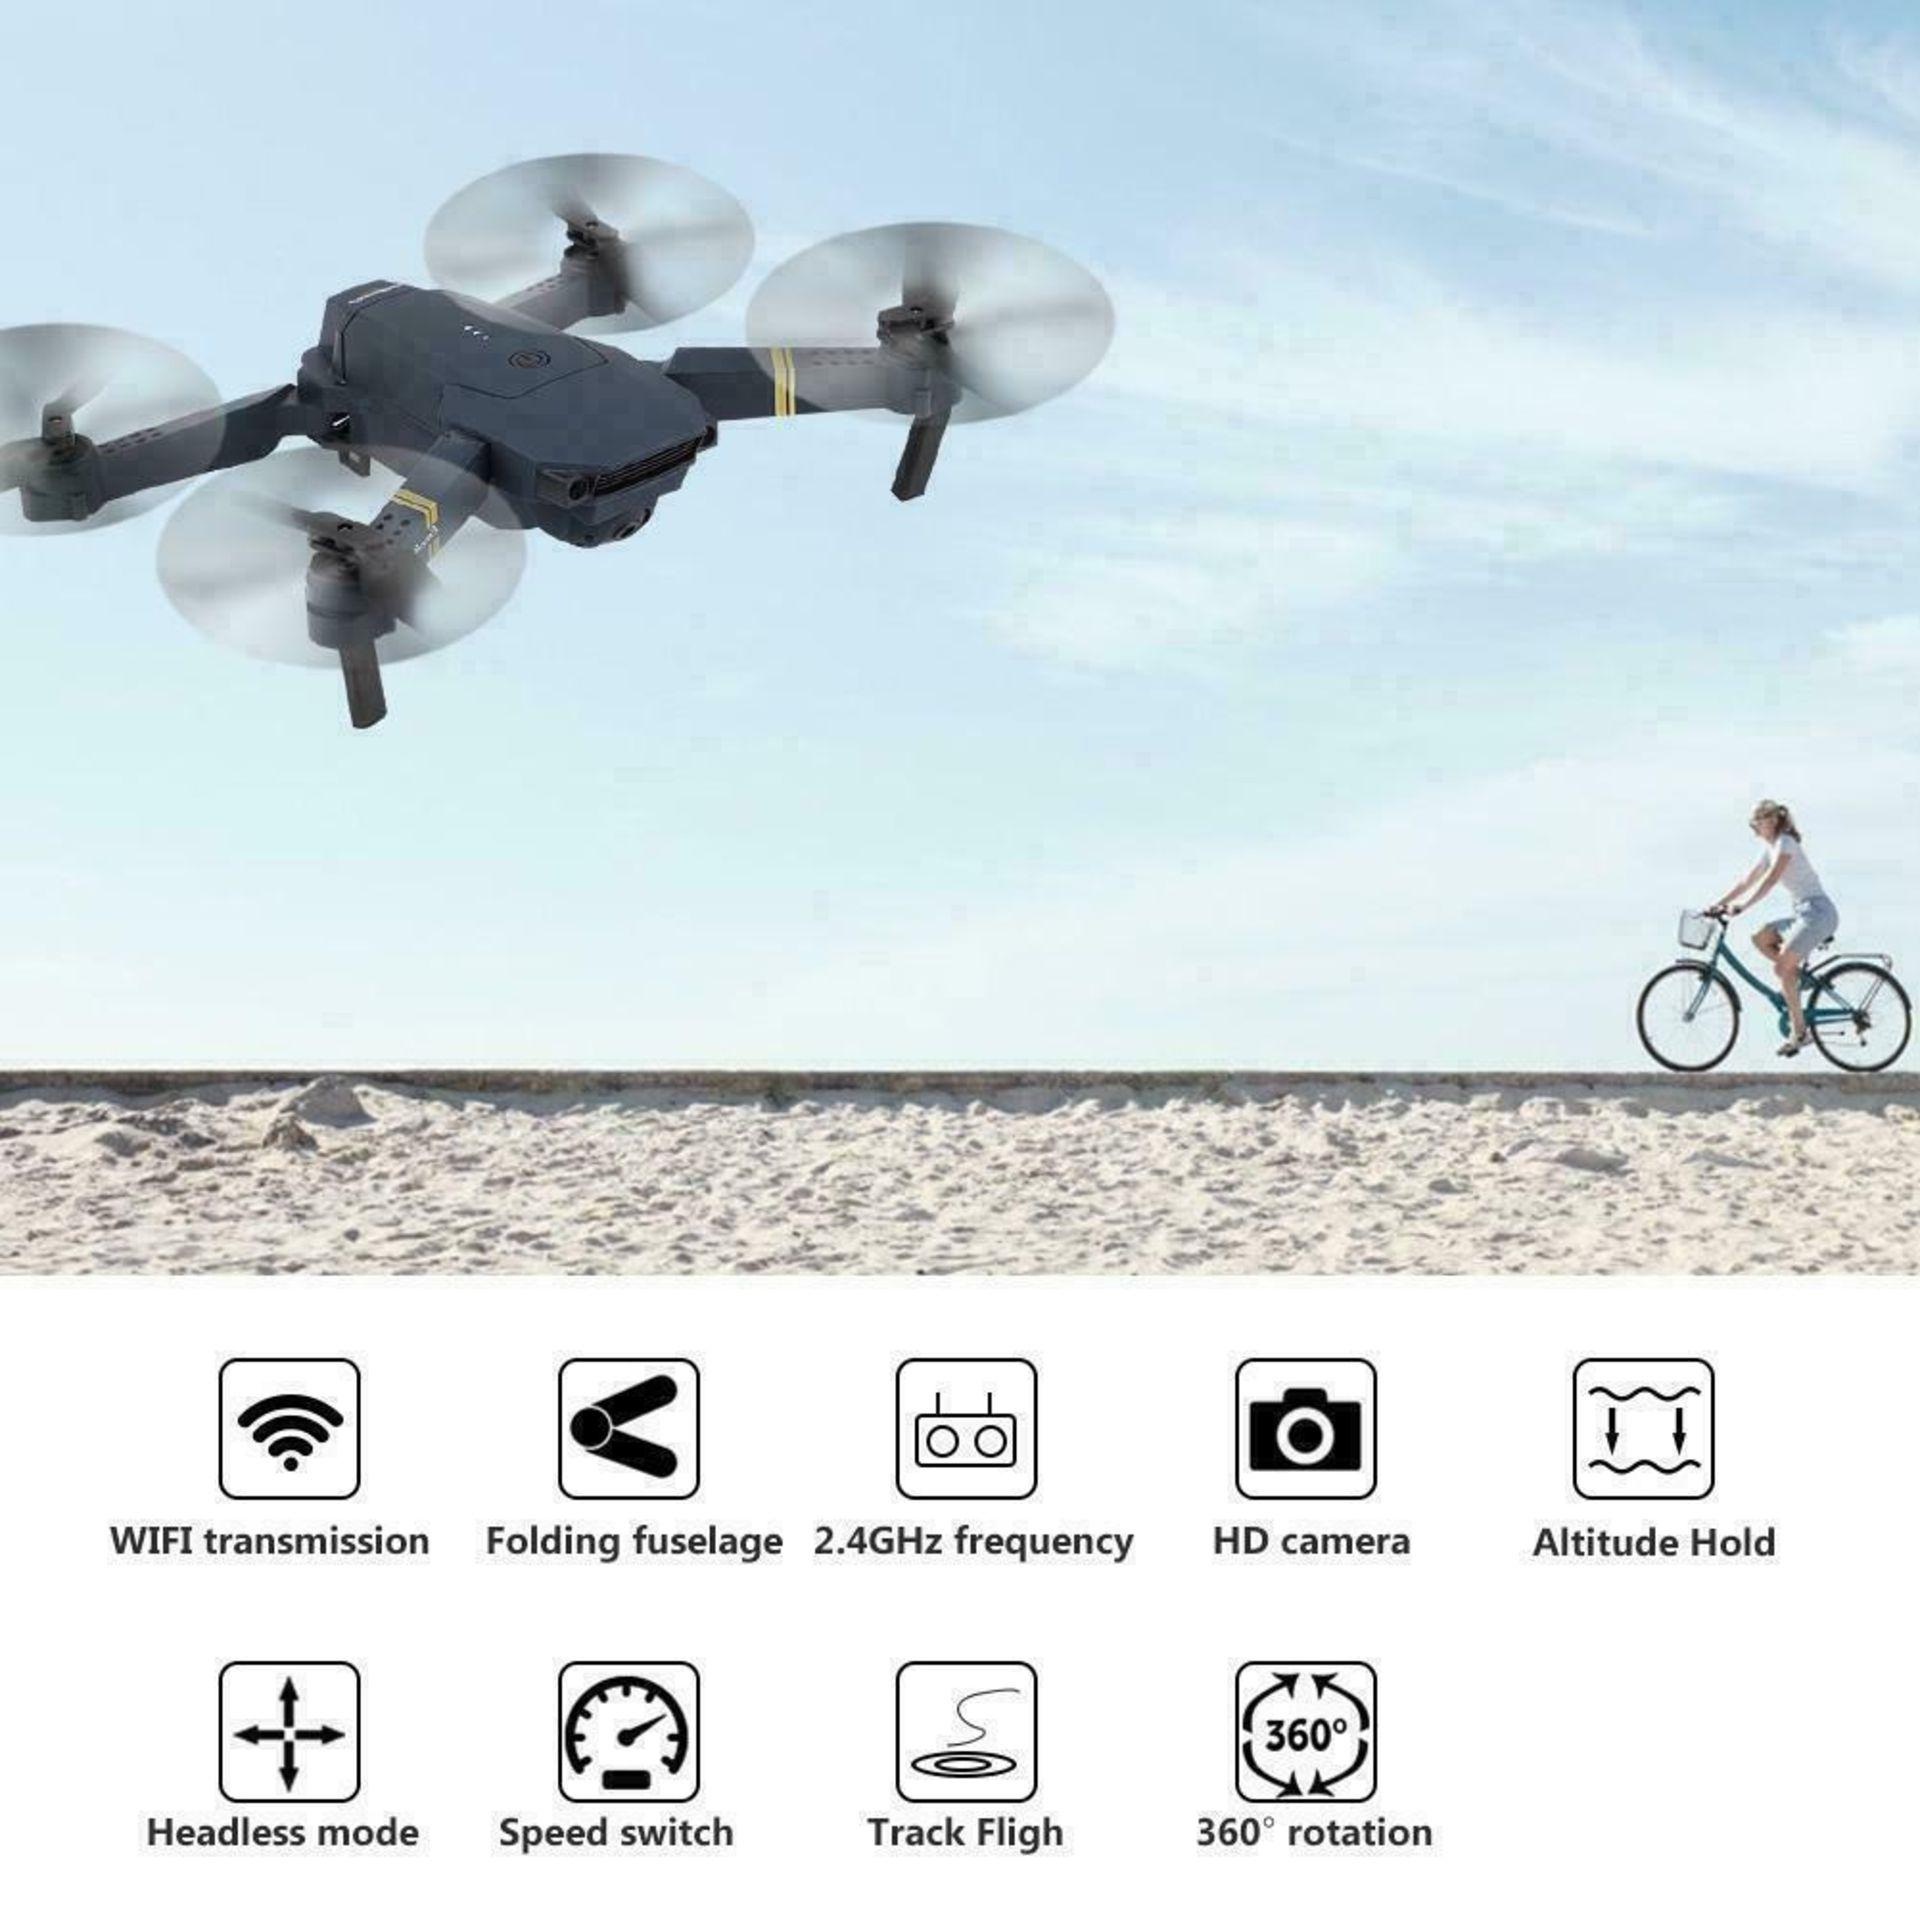 NEW & UNUSED DRONE X PRO WIFI FPV 1080P HD CAMERA FOLDABLE RC QUADCOPTER + BAG *PLUS VAT* - Image 5 of 9